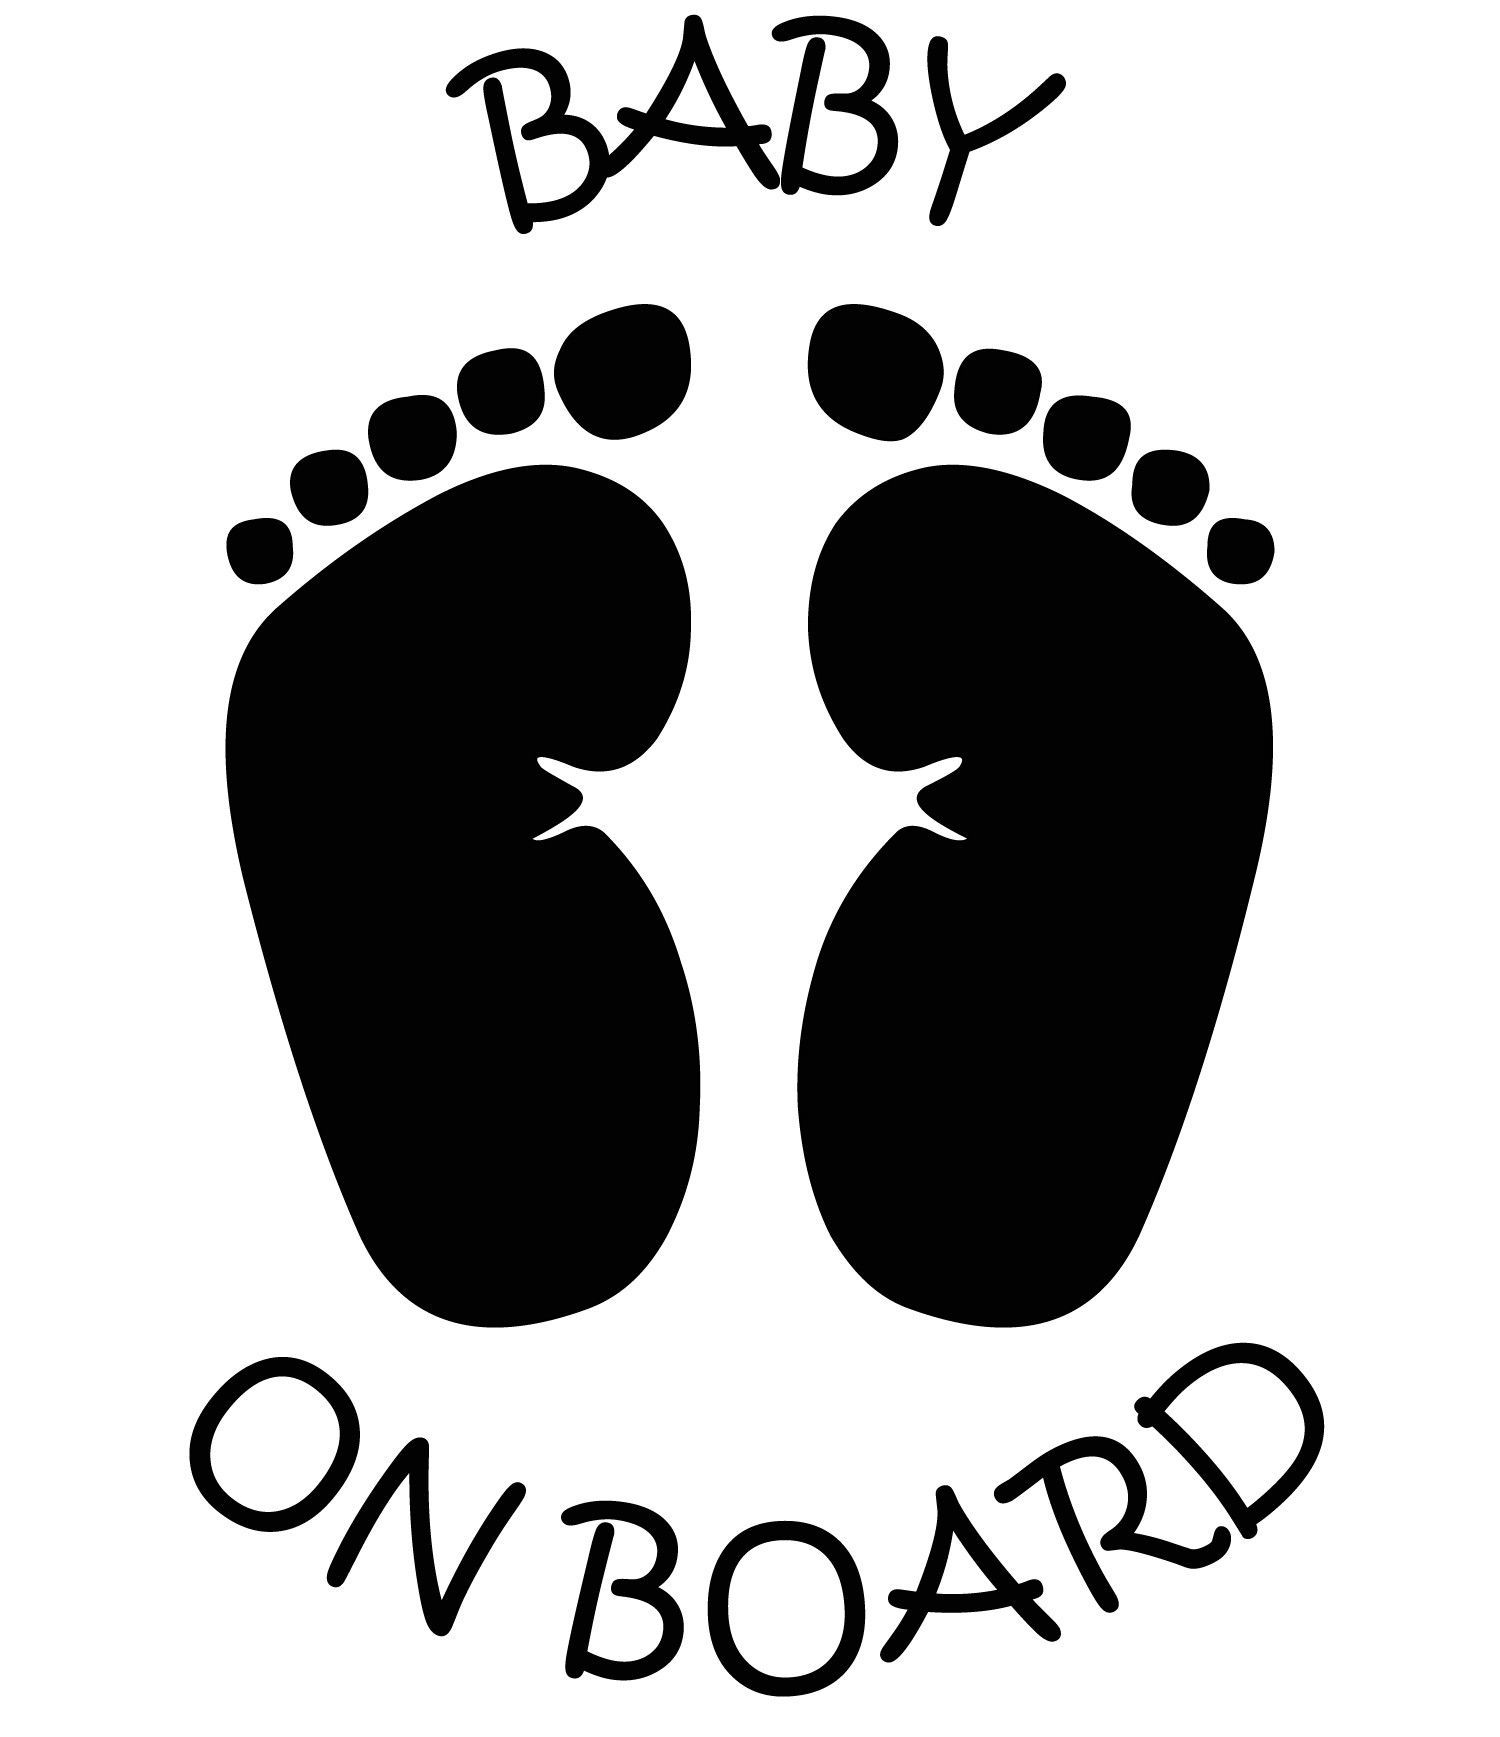 Baby on board feet Foot prints Car Sticker Decal Graphic Vinyl Label  Black